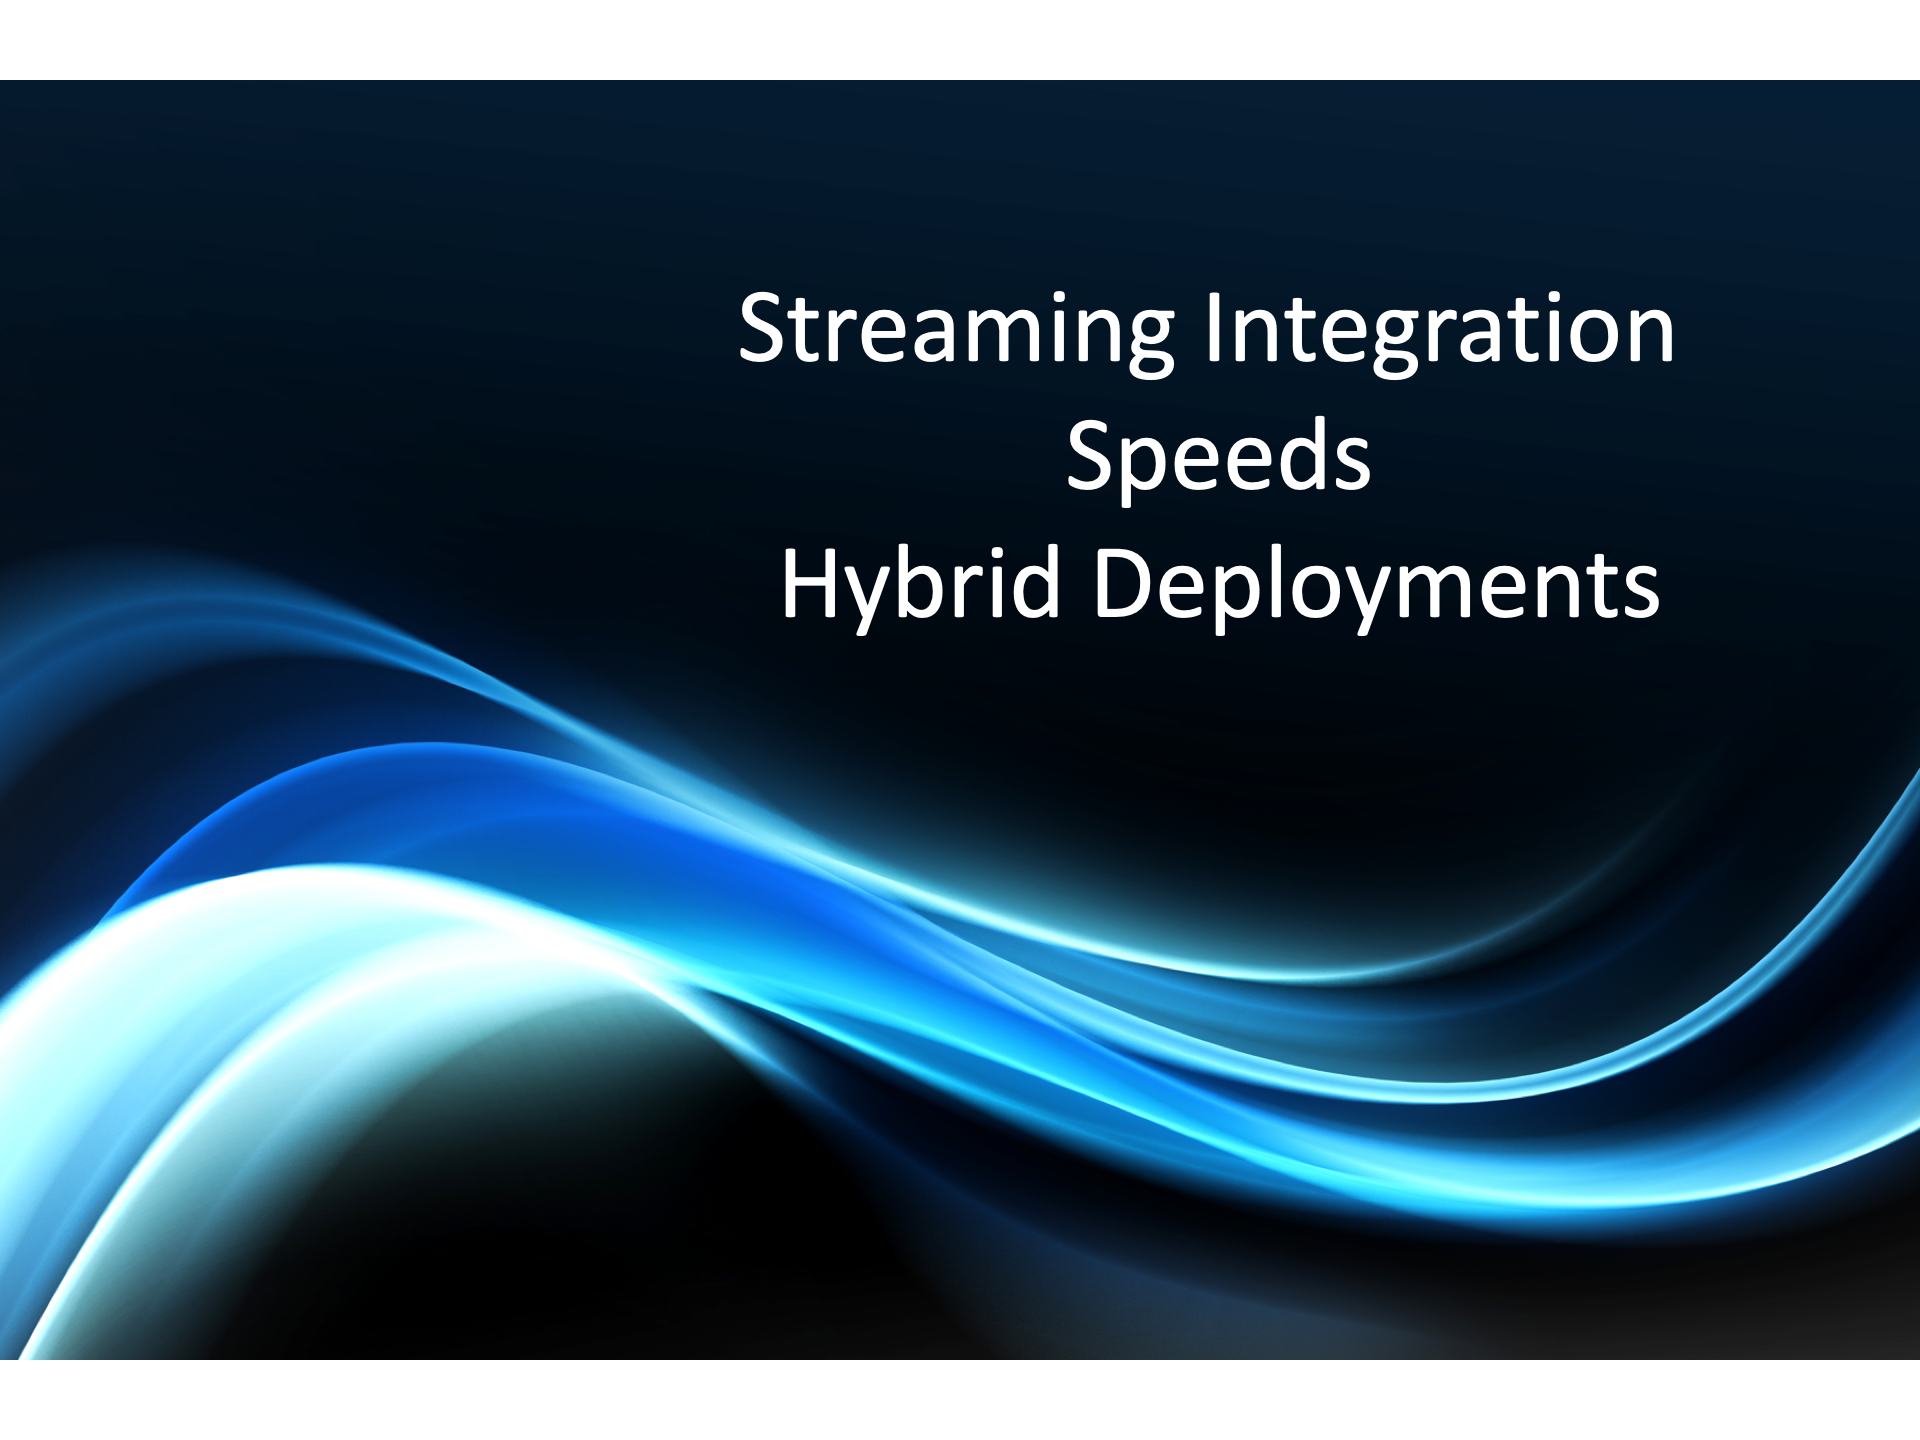 Hybrid Deployments